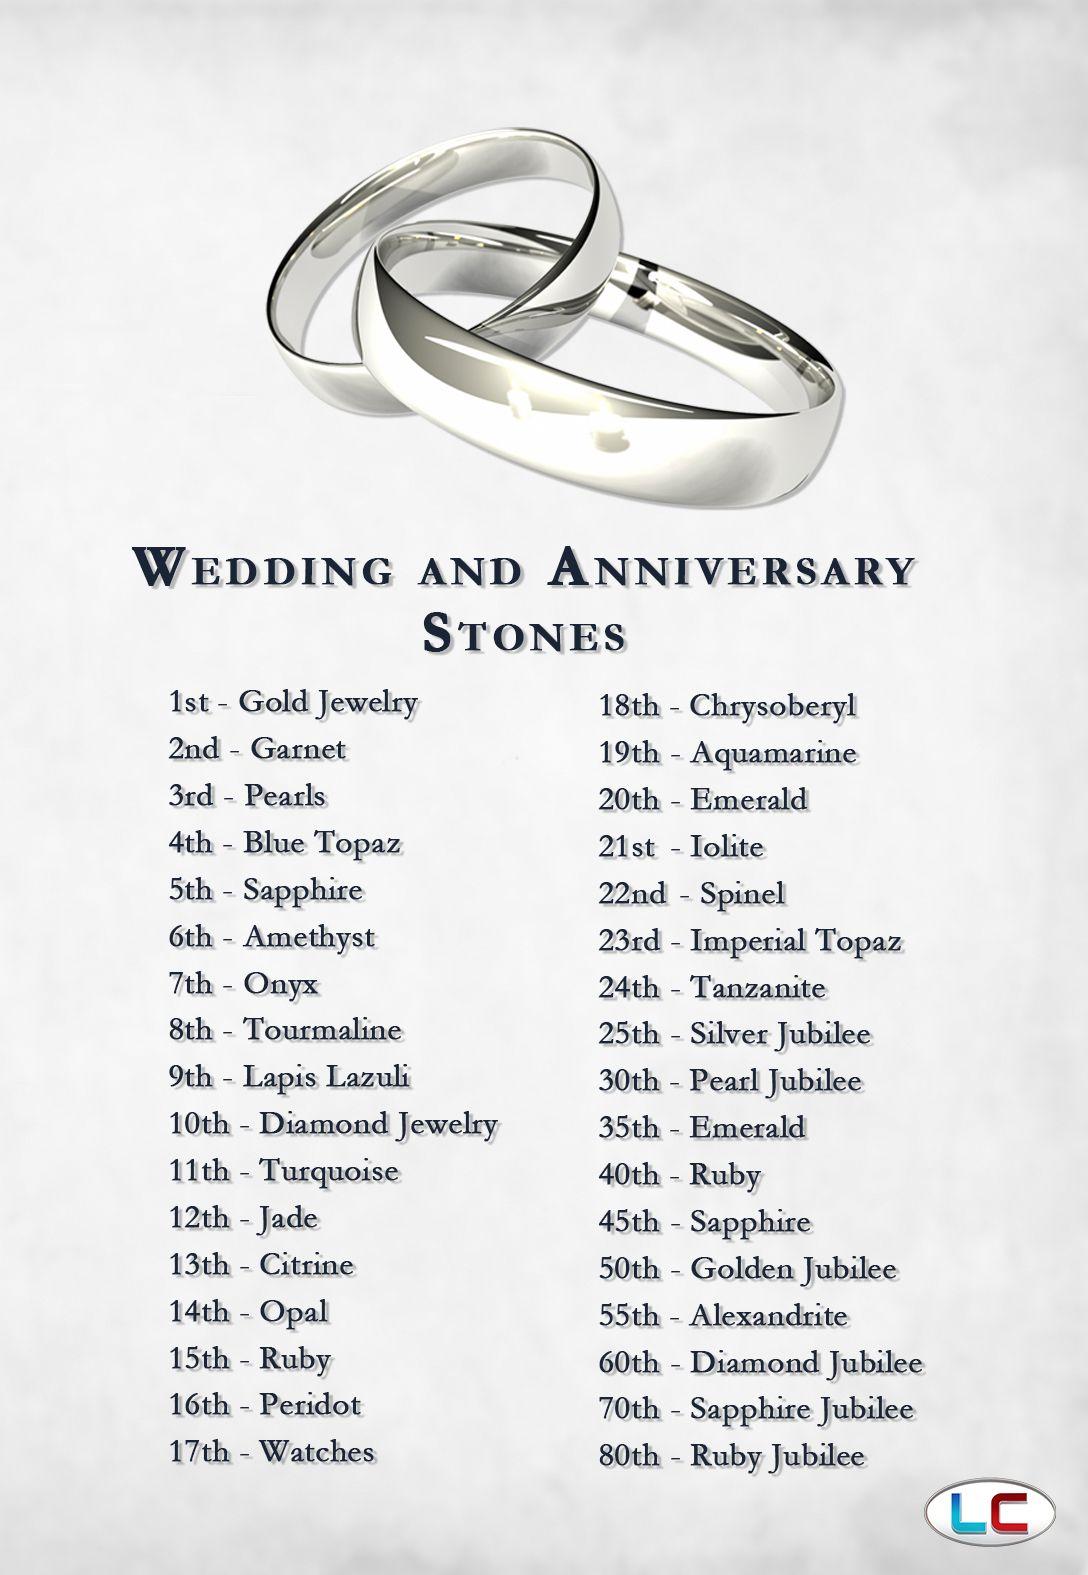 Wedding and Anniversary Gemstones 10th Anniversary is